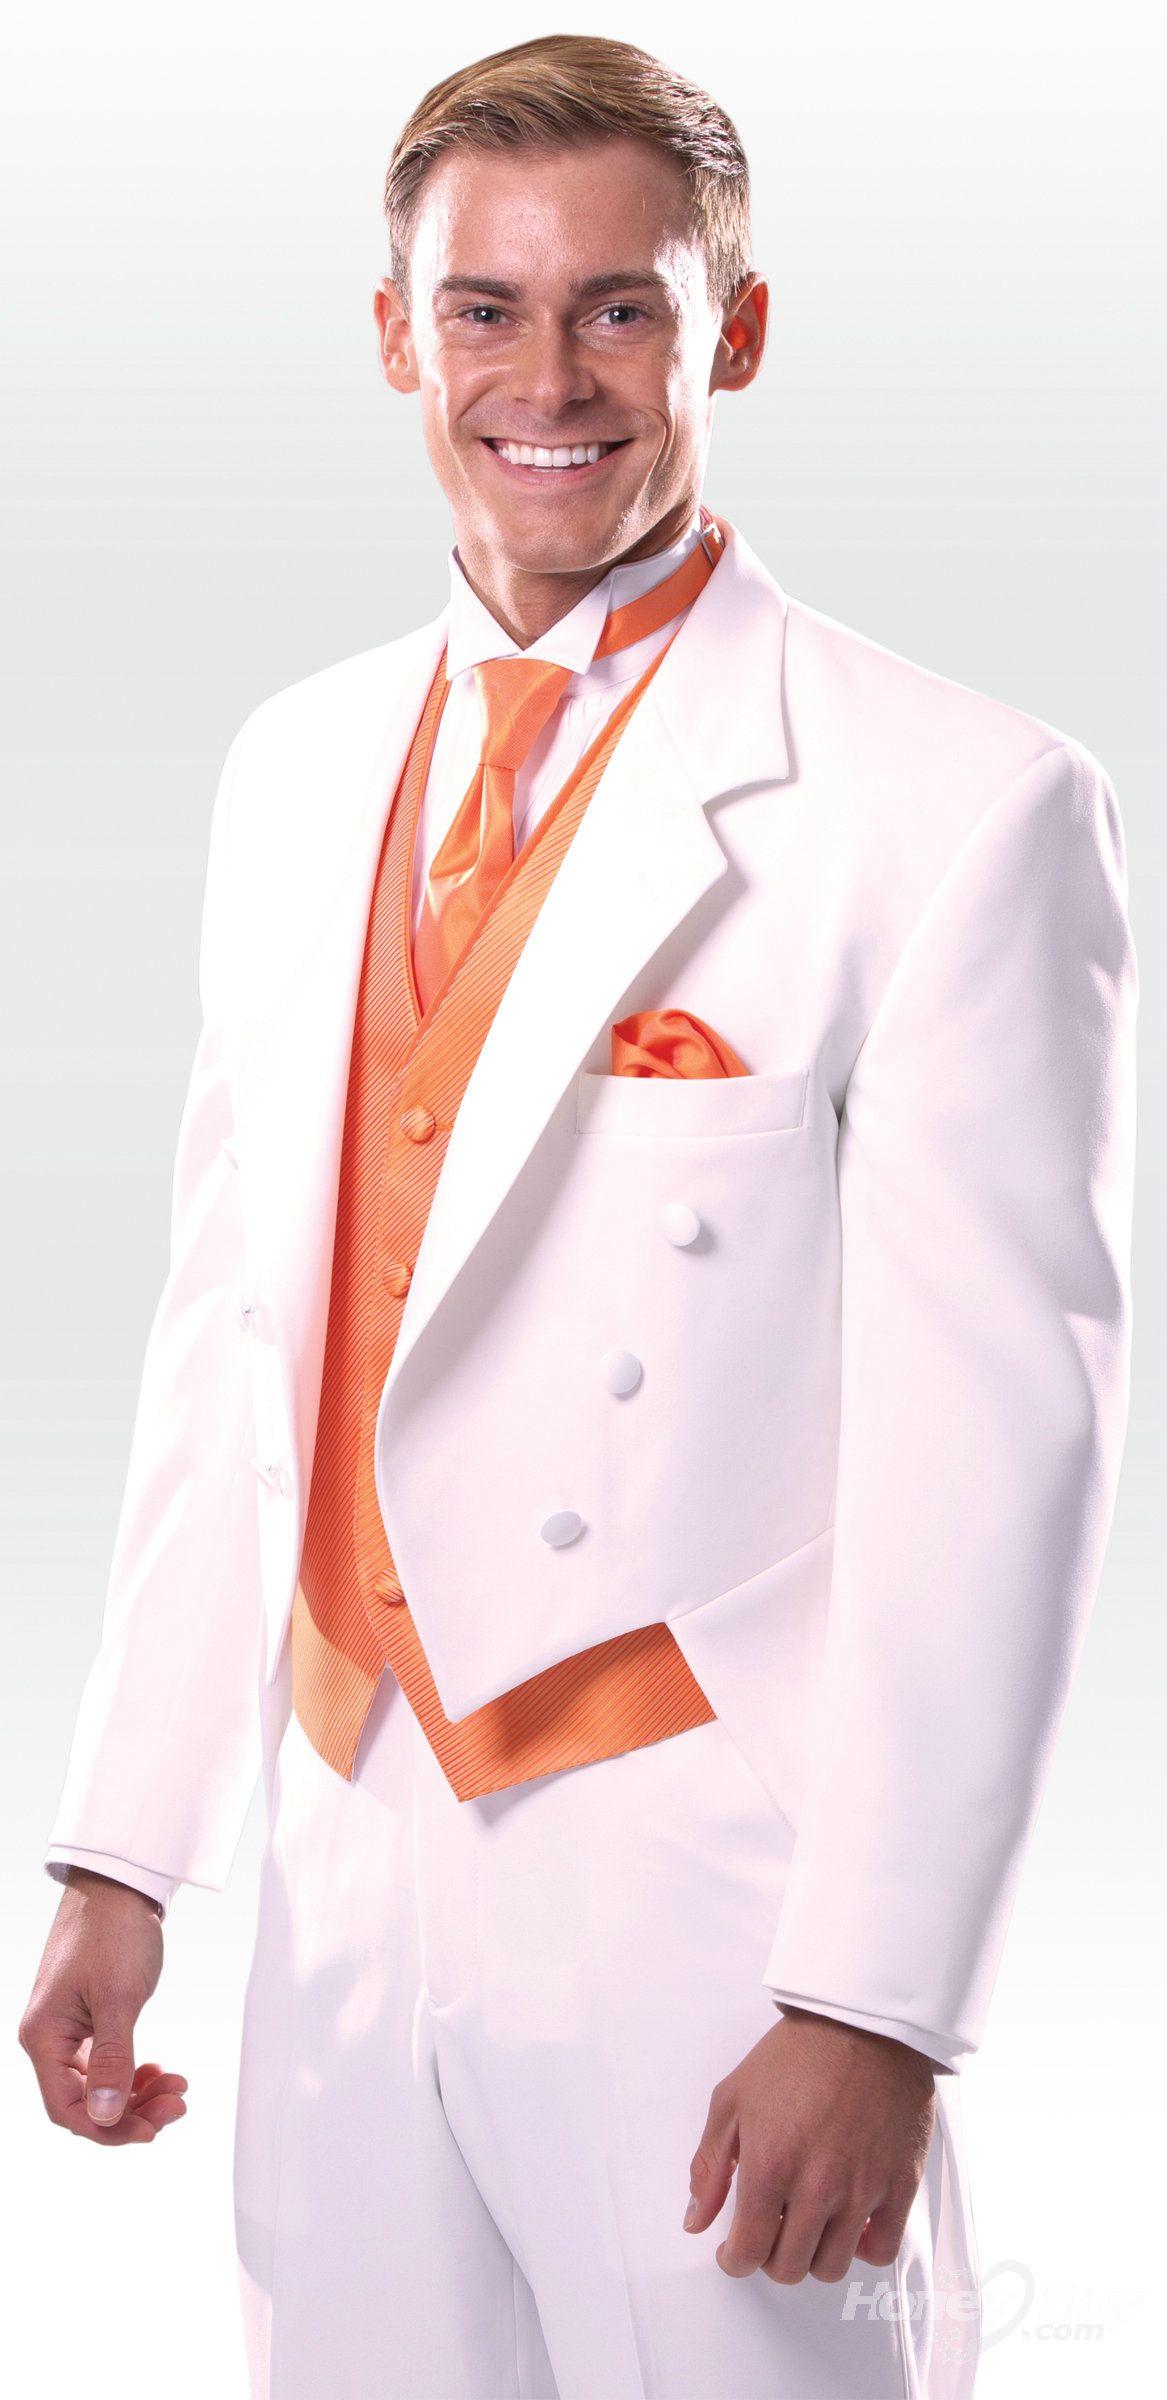 White Tail Coat Tuxedo | CHESTI DE PURTAT | Pinterest | White tail ...